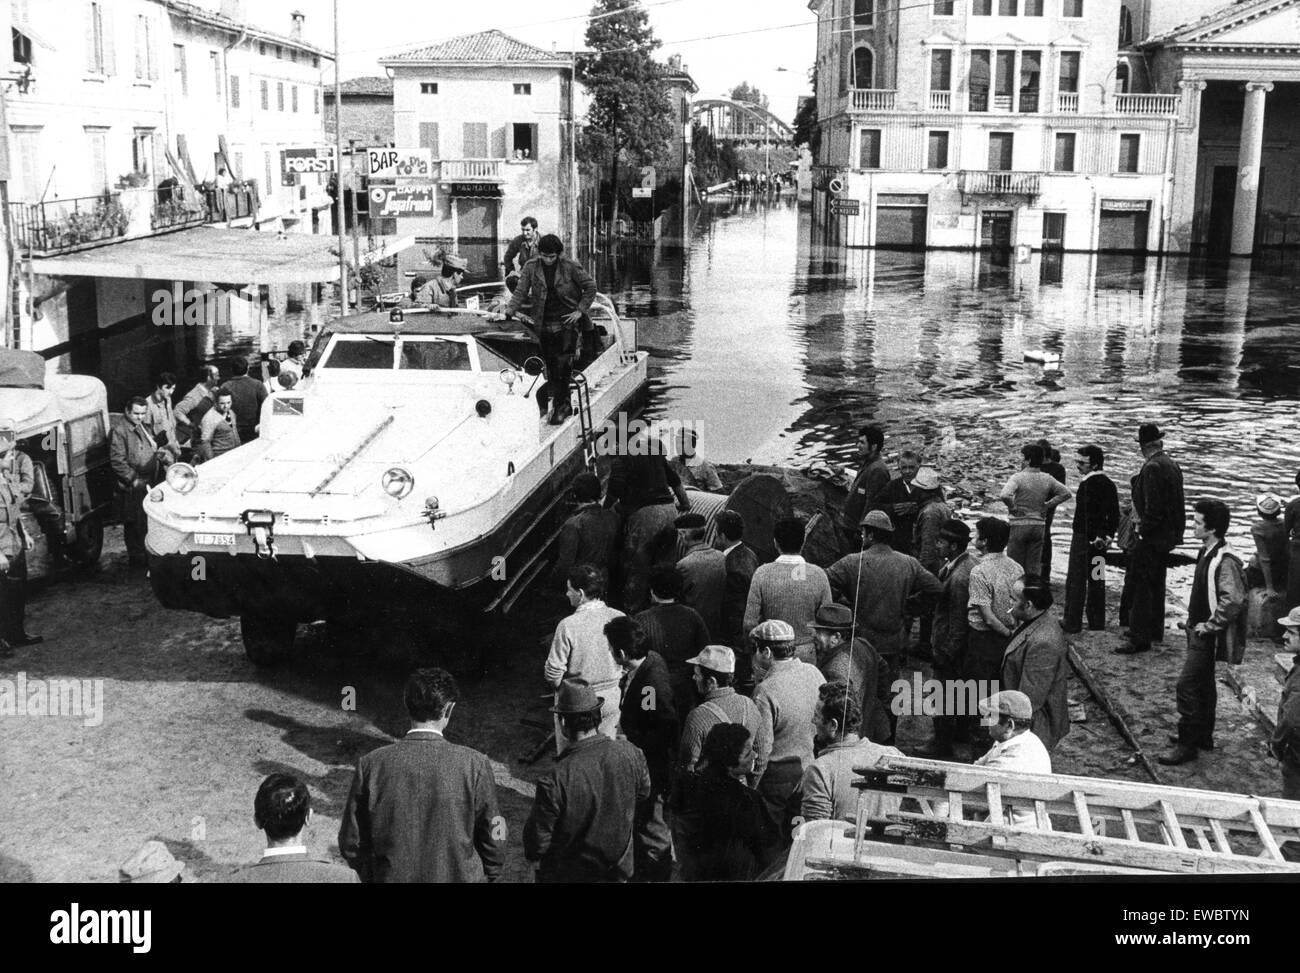 flood in modena,1973 - Stock Image